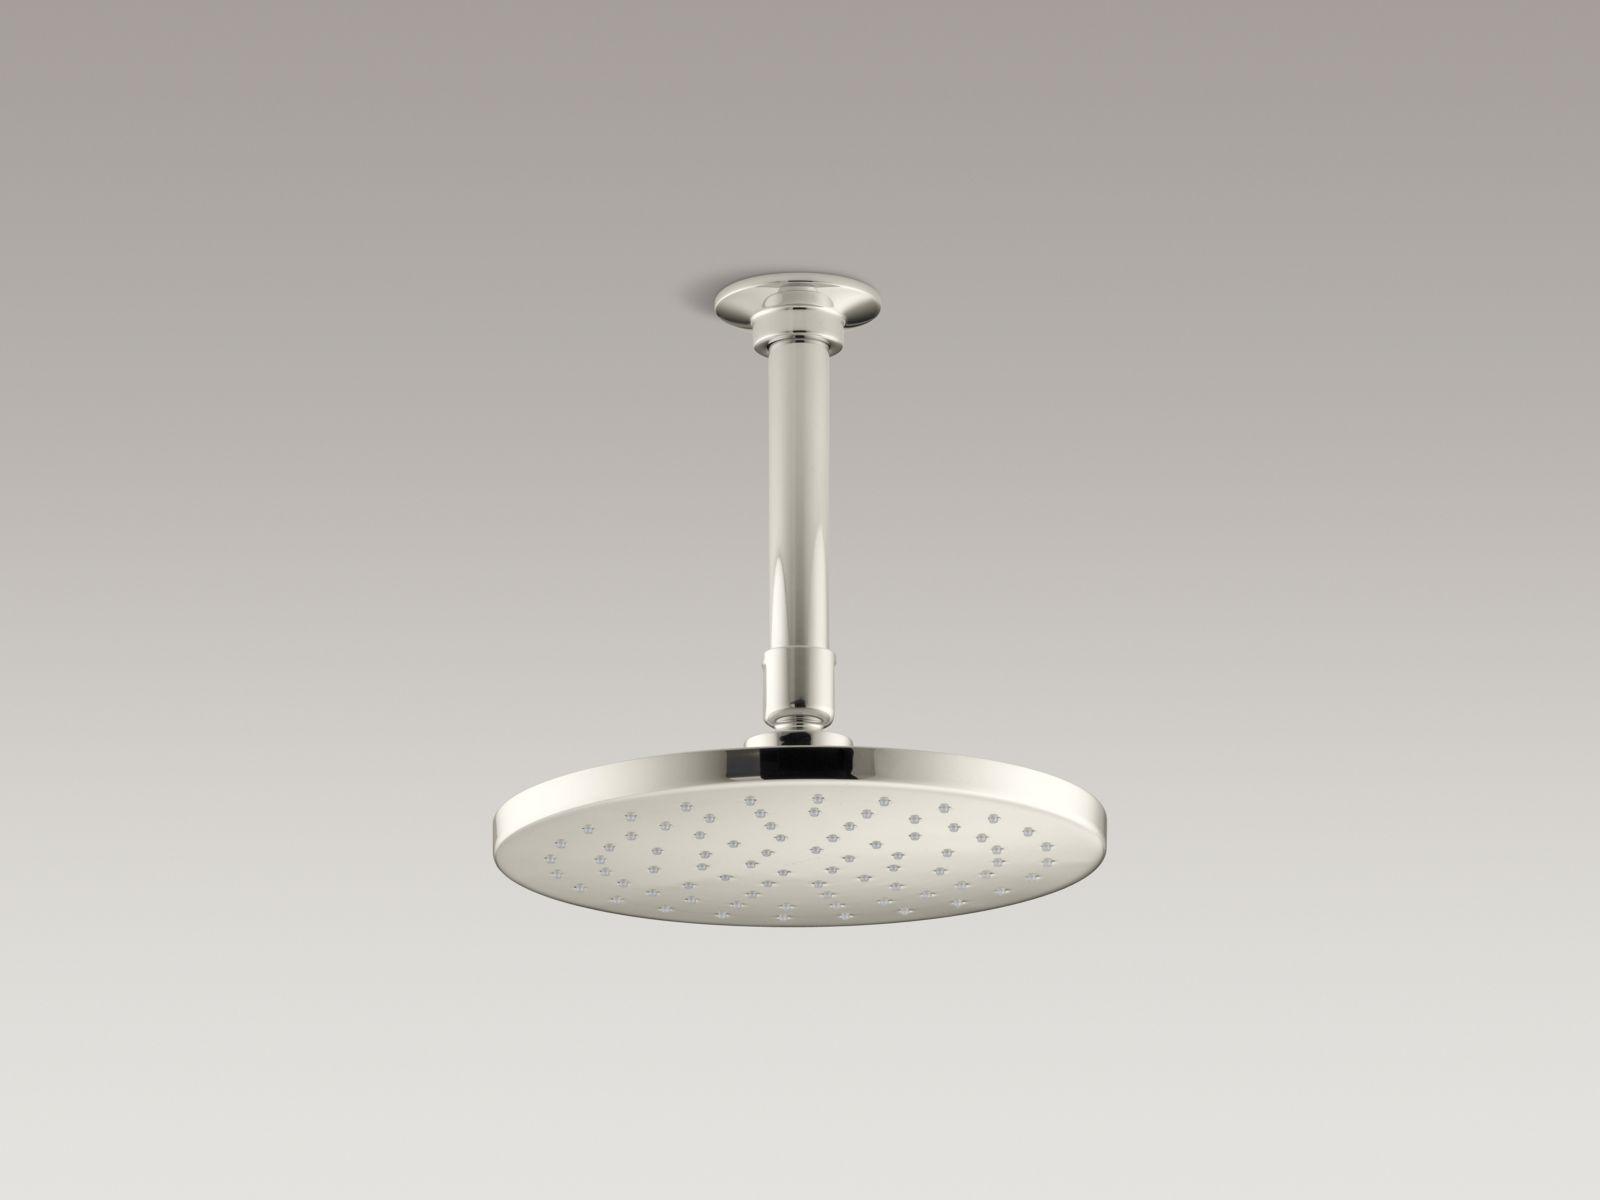 Kohler K-13688-SN 8 In. Contemporary Round Rain Showerhead Vibrant Polished Nickel